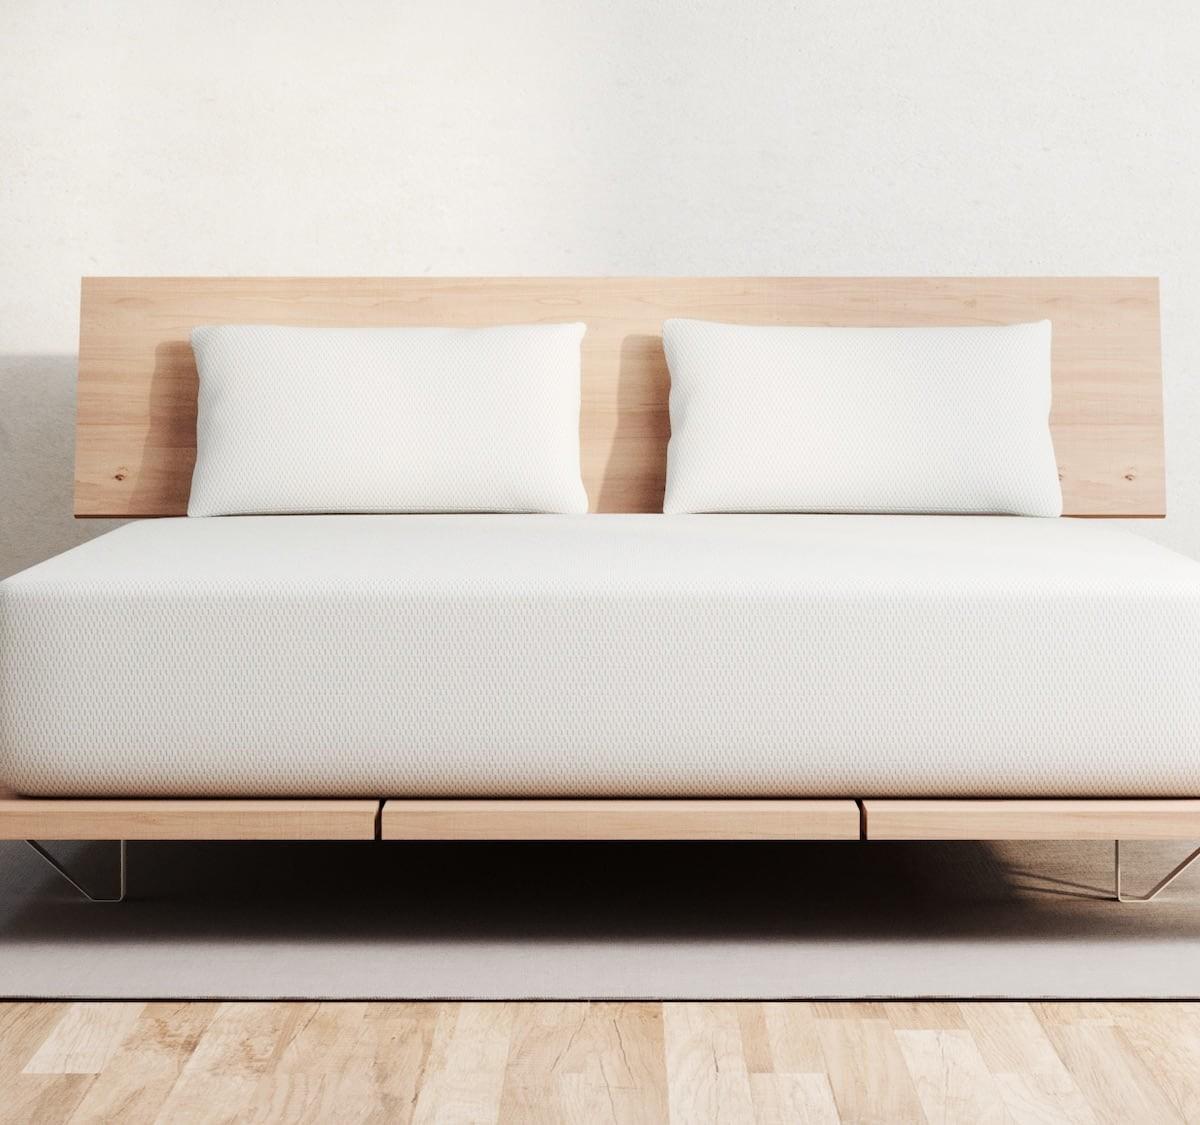 Vaya comfort foam mattress includes a 100-night sleep trial